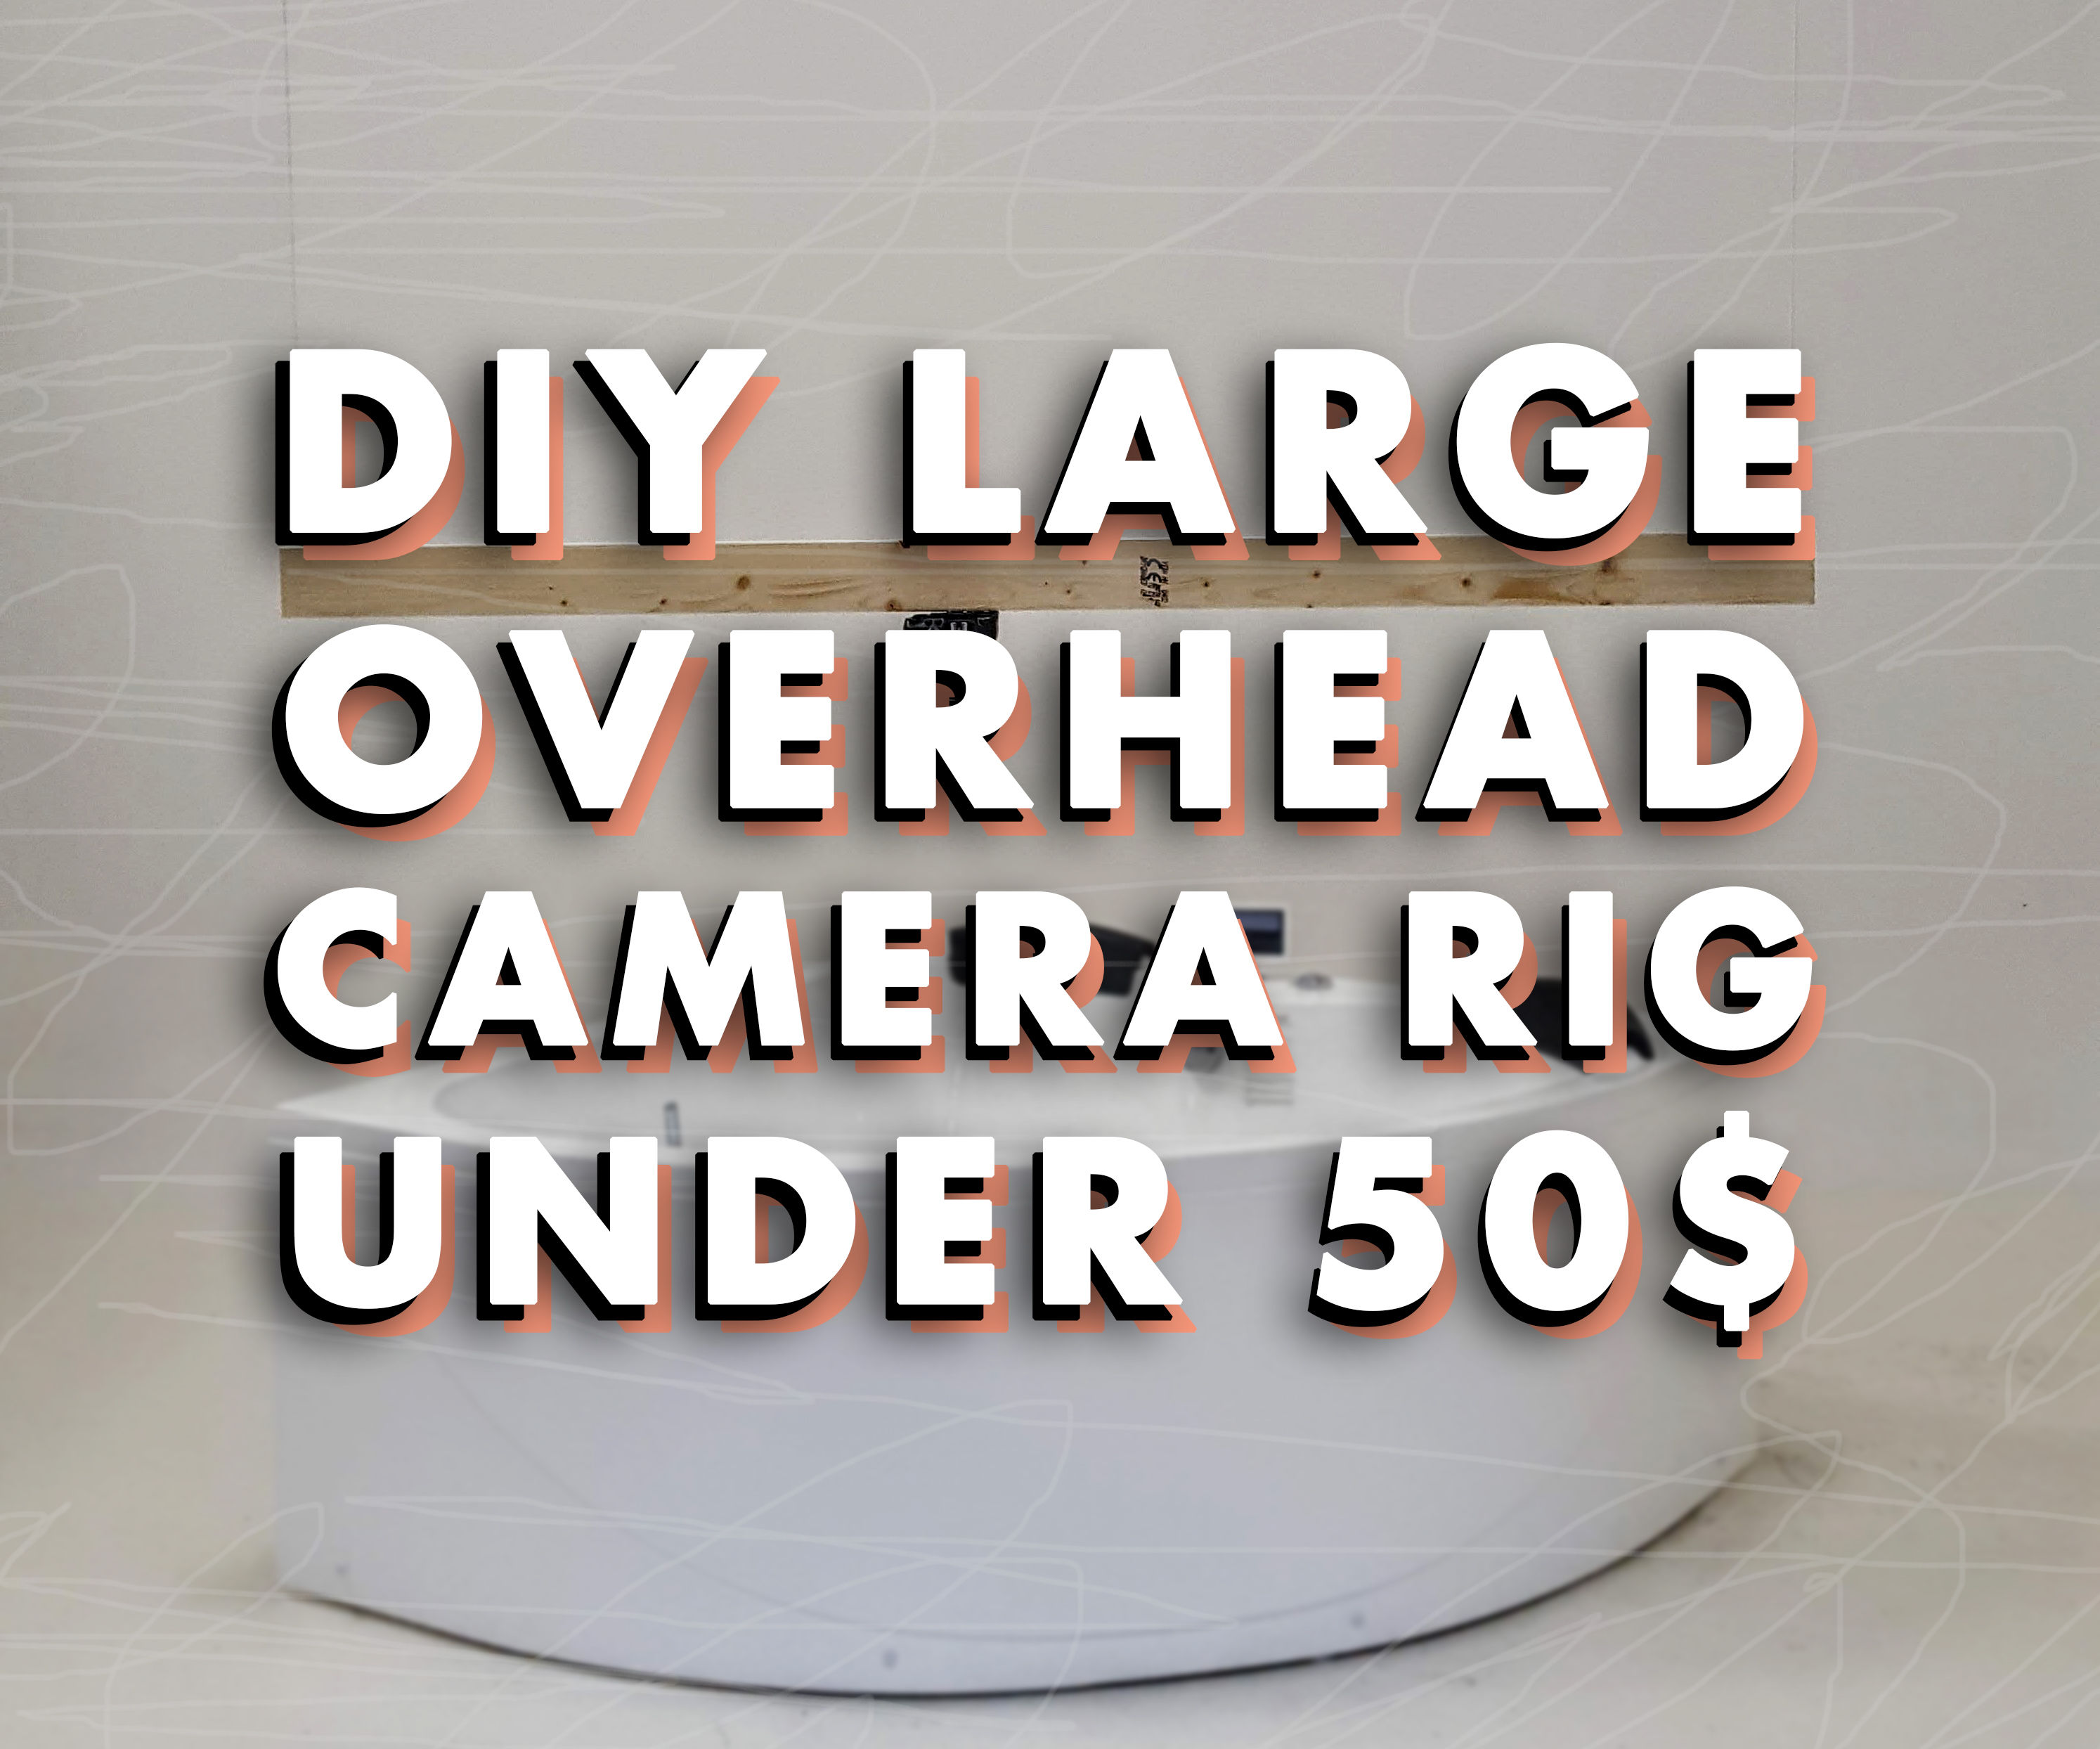 DIY Large Overhead Camera Rig Under 50$